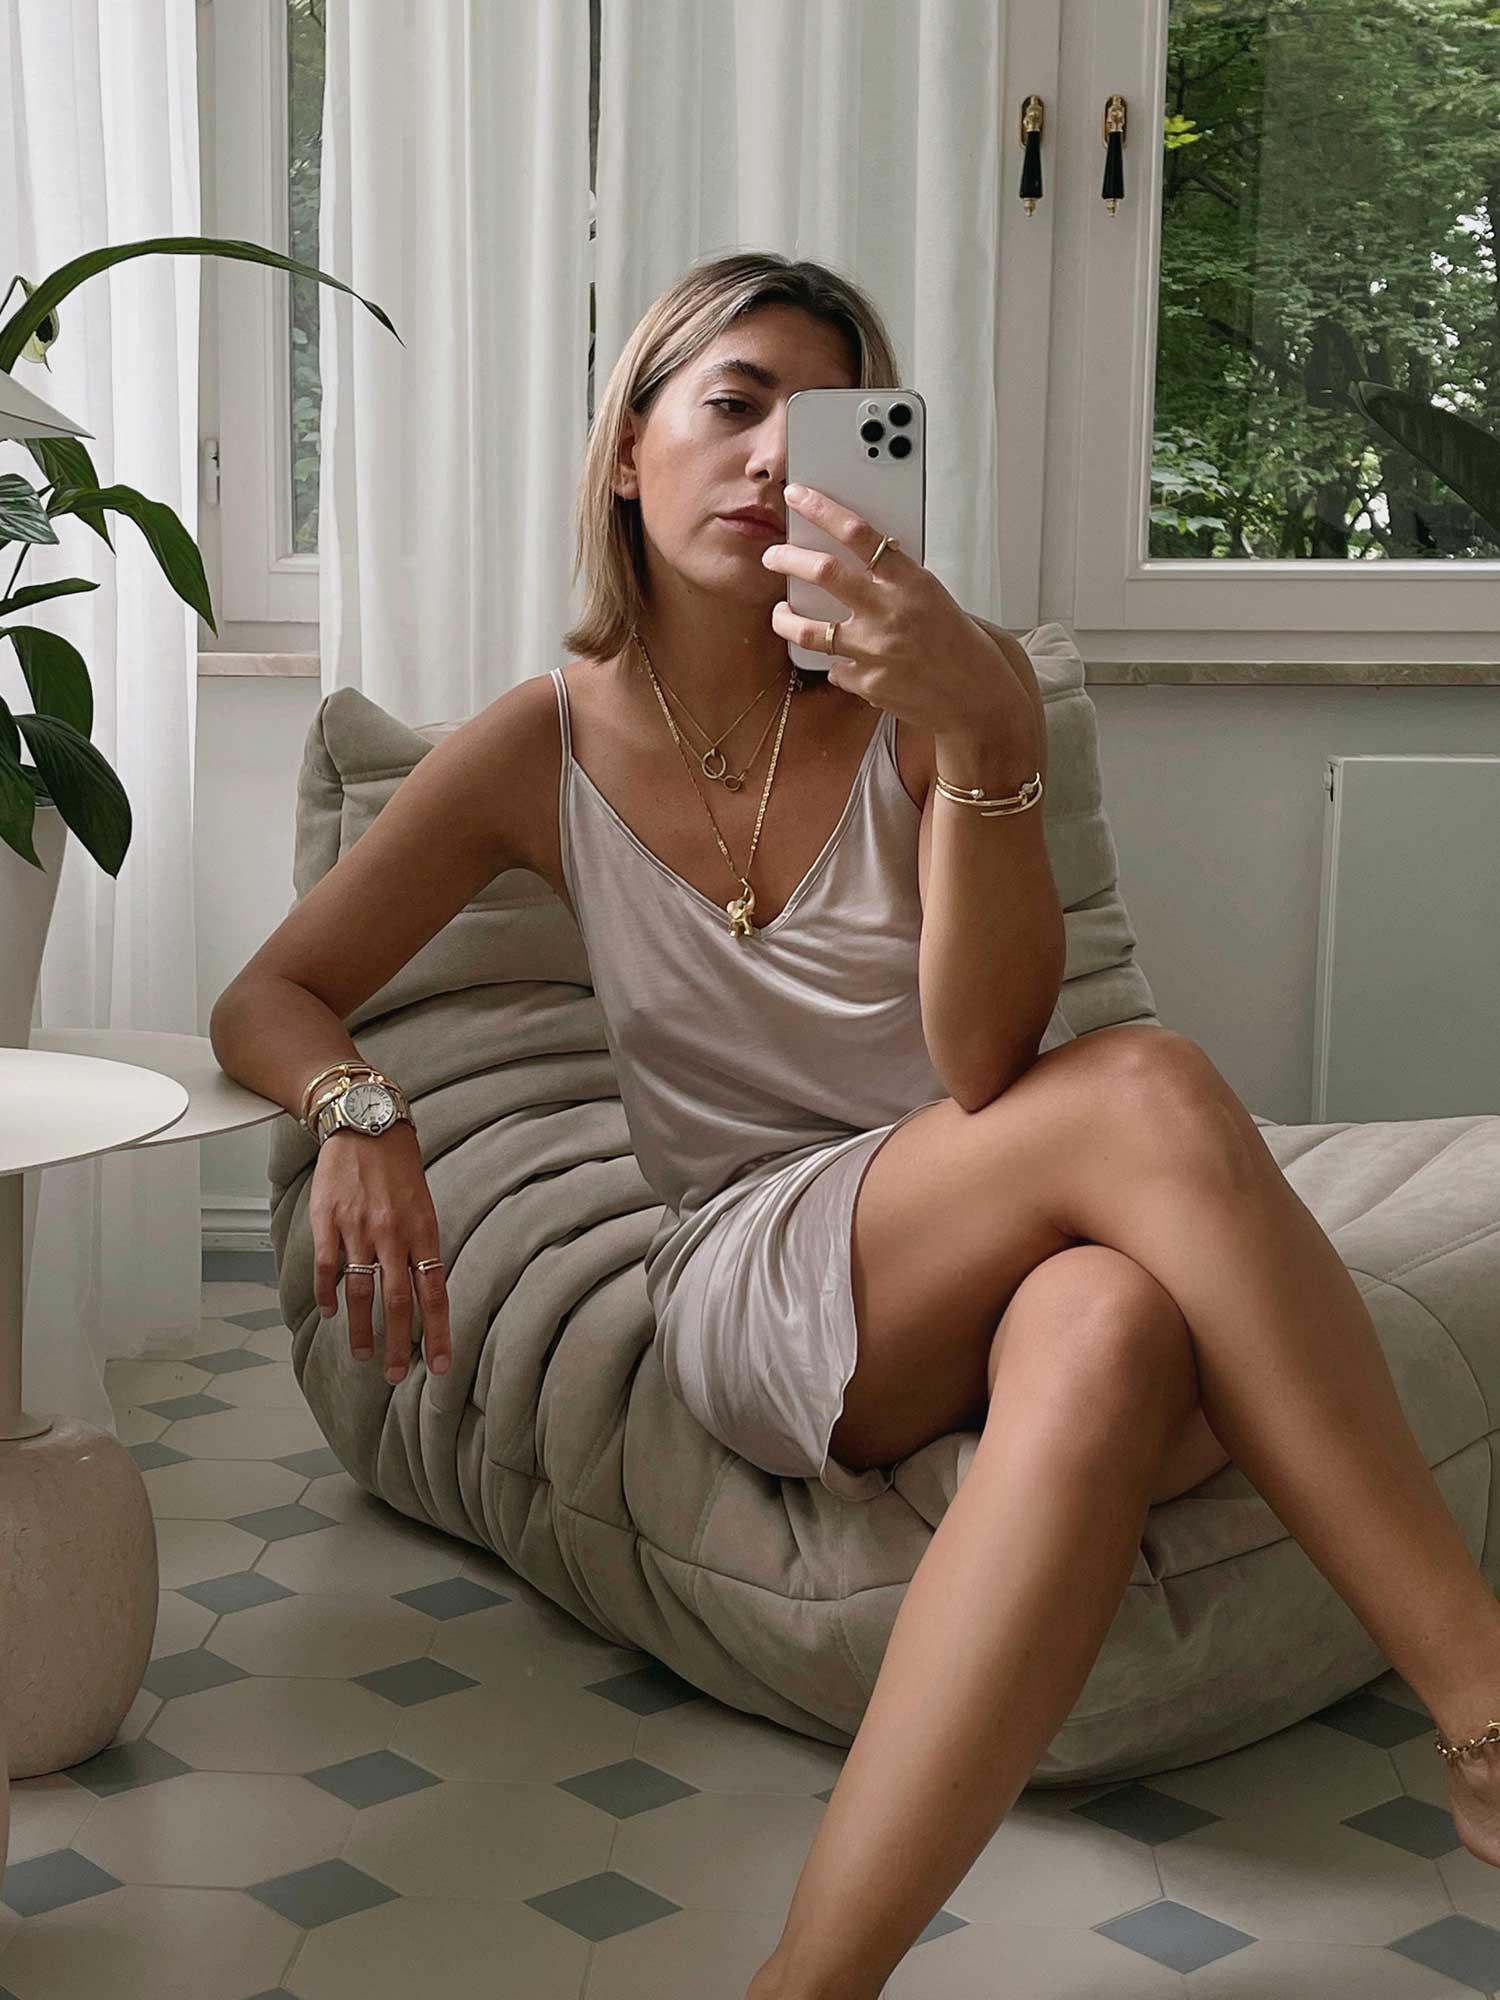 Seductive negligee by @aylin_koenig | mey®